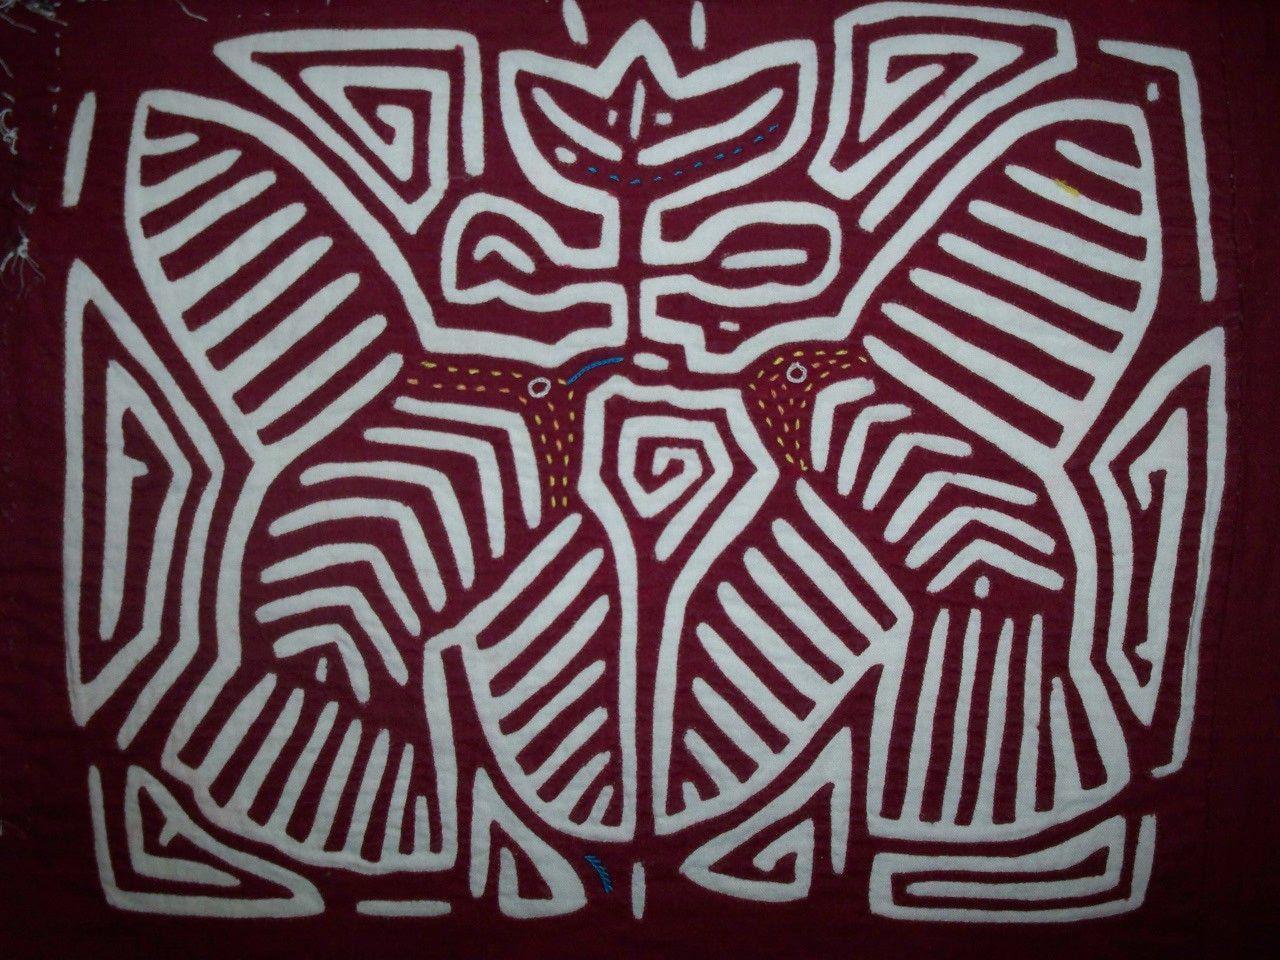 Kuna Indian Tribe Bird optical Illusion Mola Panama San Blas-12.62197